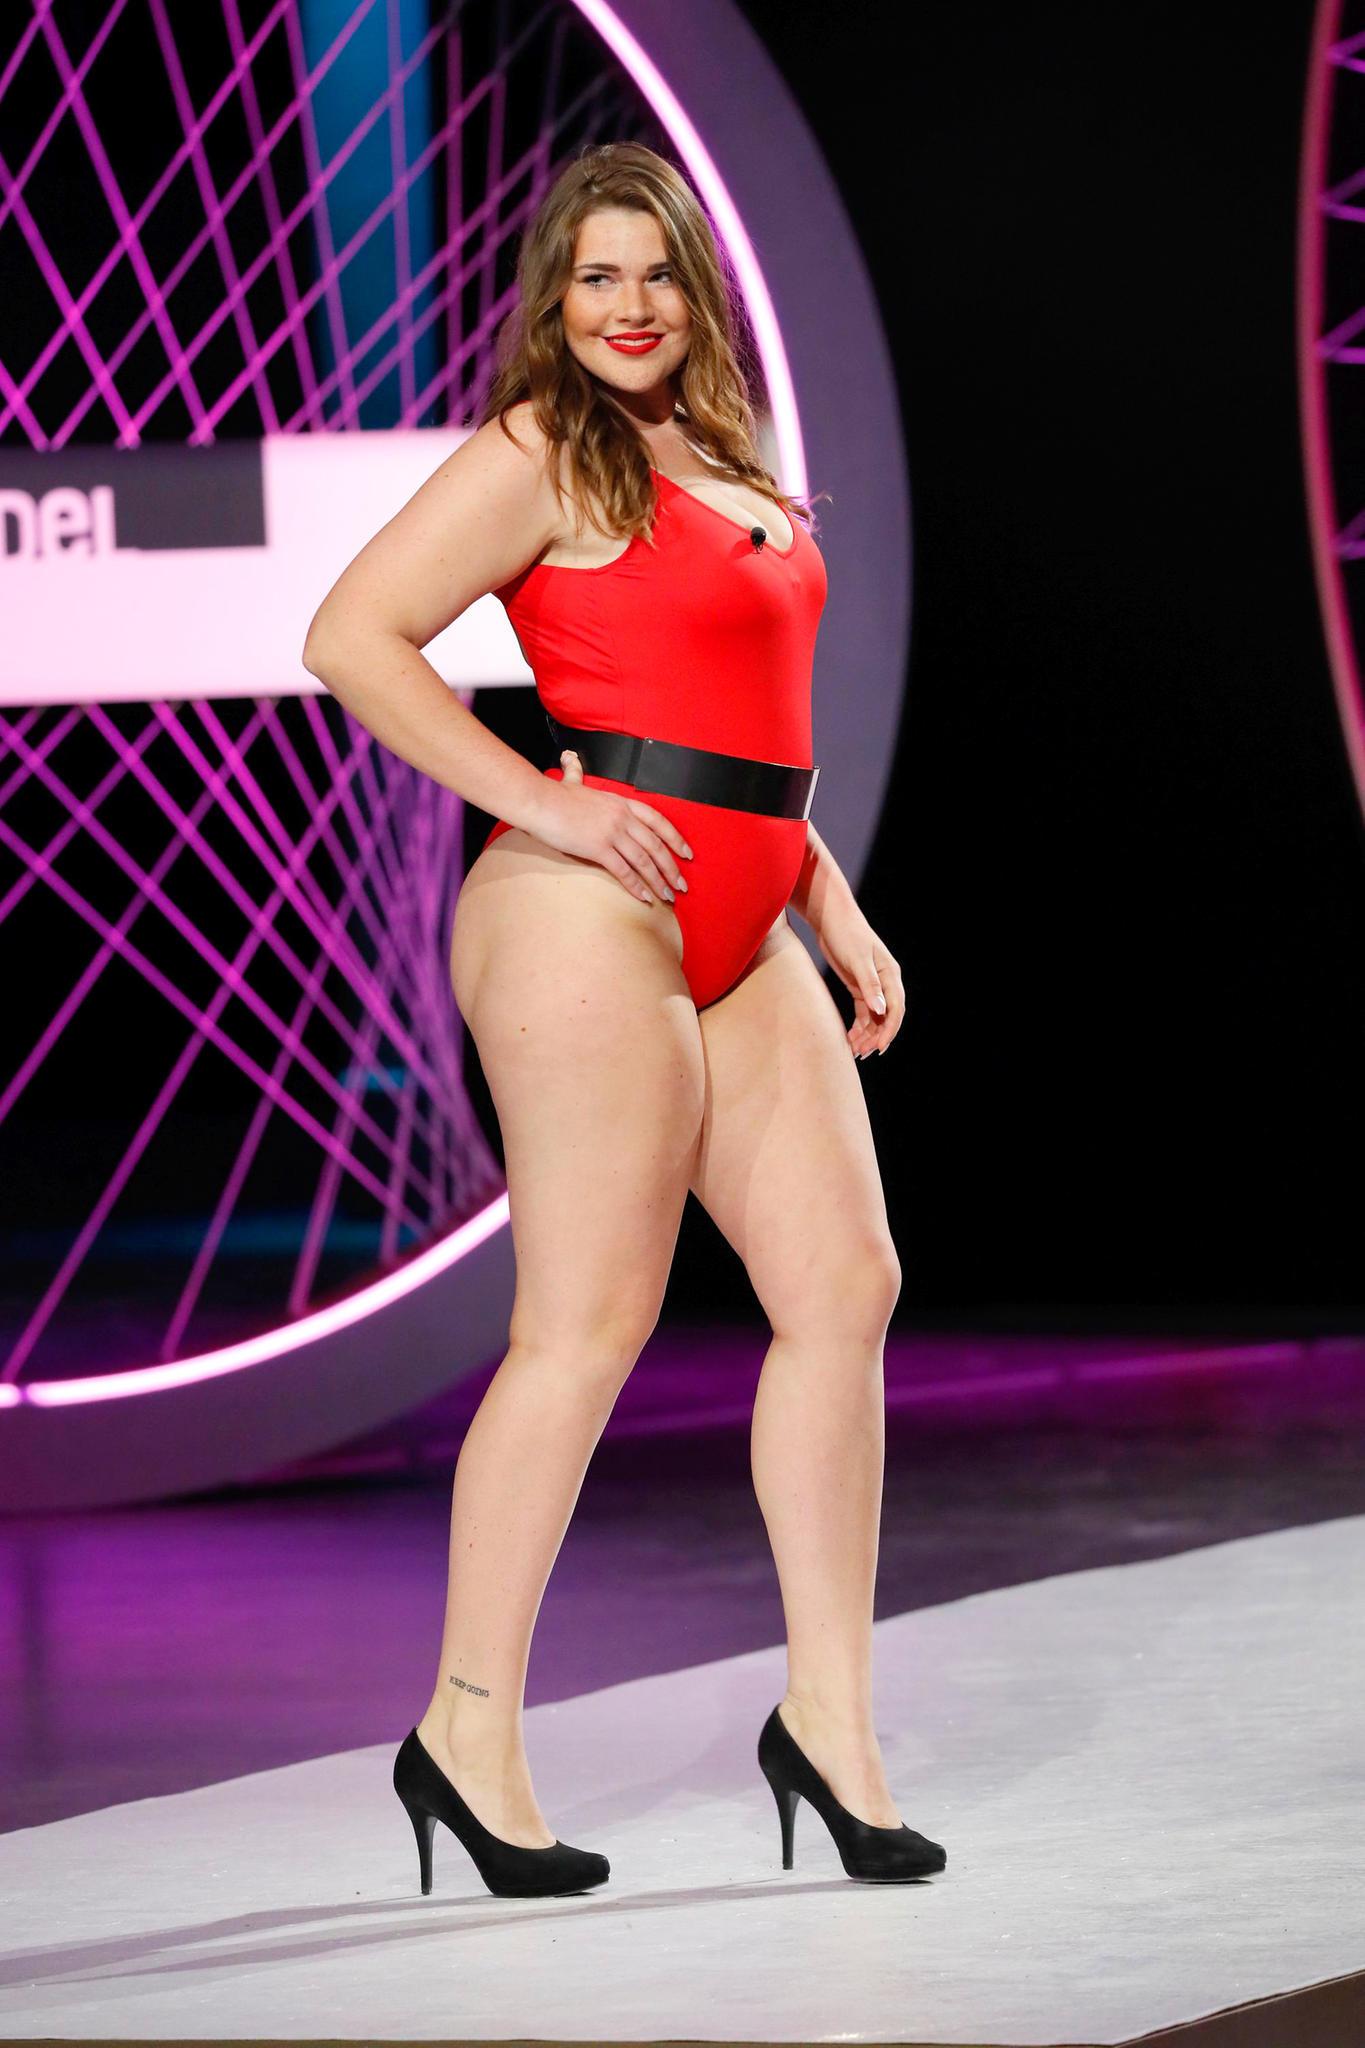 curvy supermodel kandidatinnen 2019